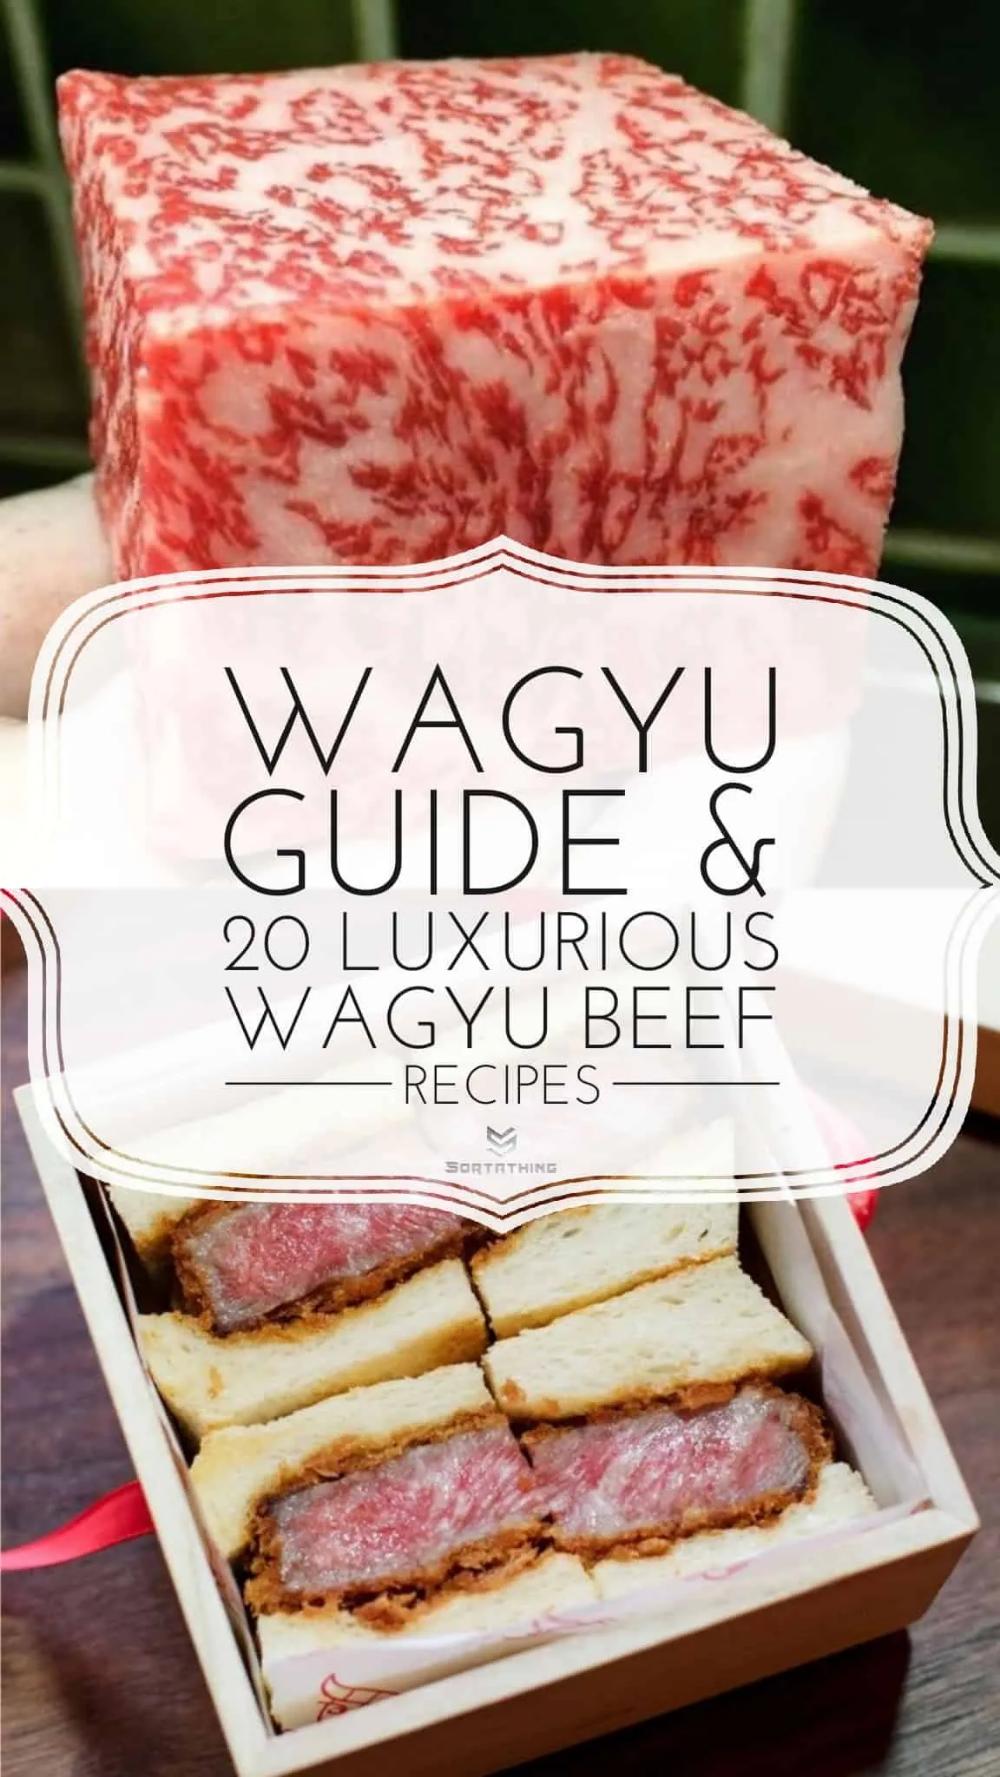 20 Luxurious Wagyu Beef Recipes Sortathing Wagyu Beef Recipe Wagyu Recipes Beef Recipes